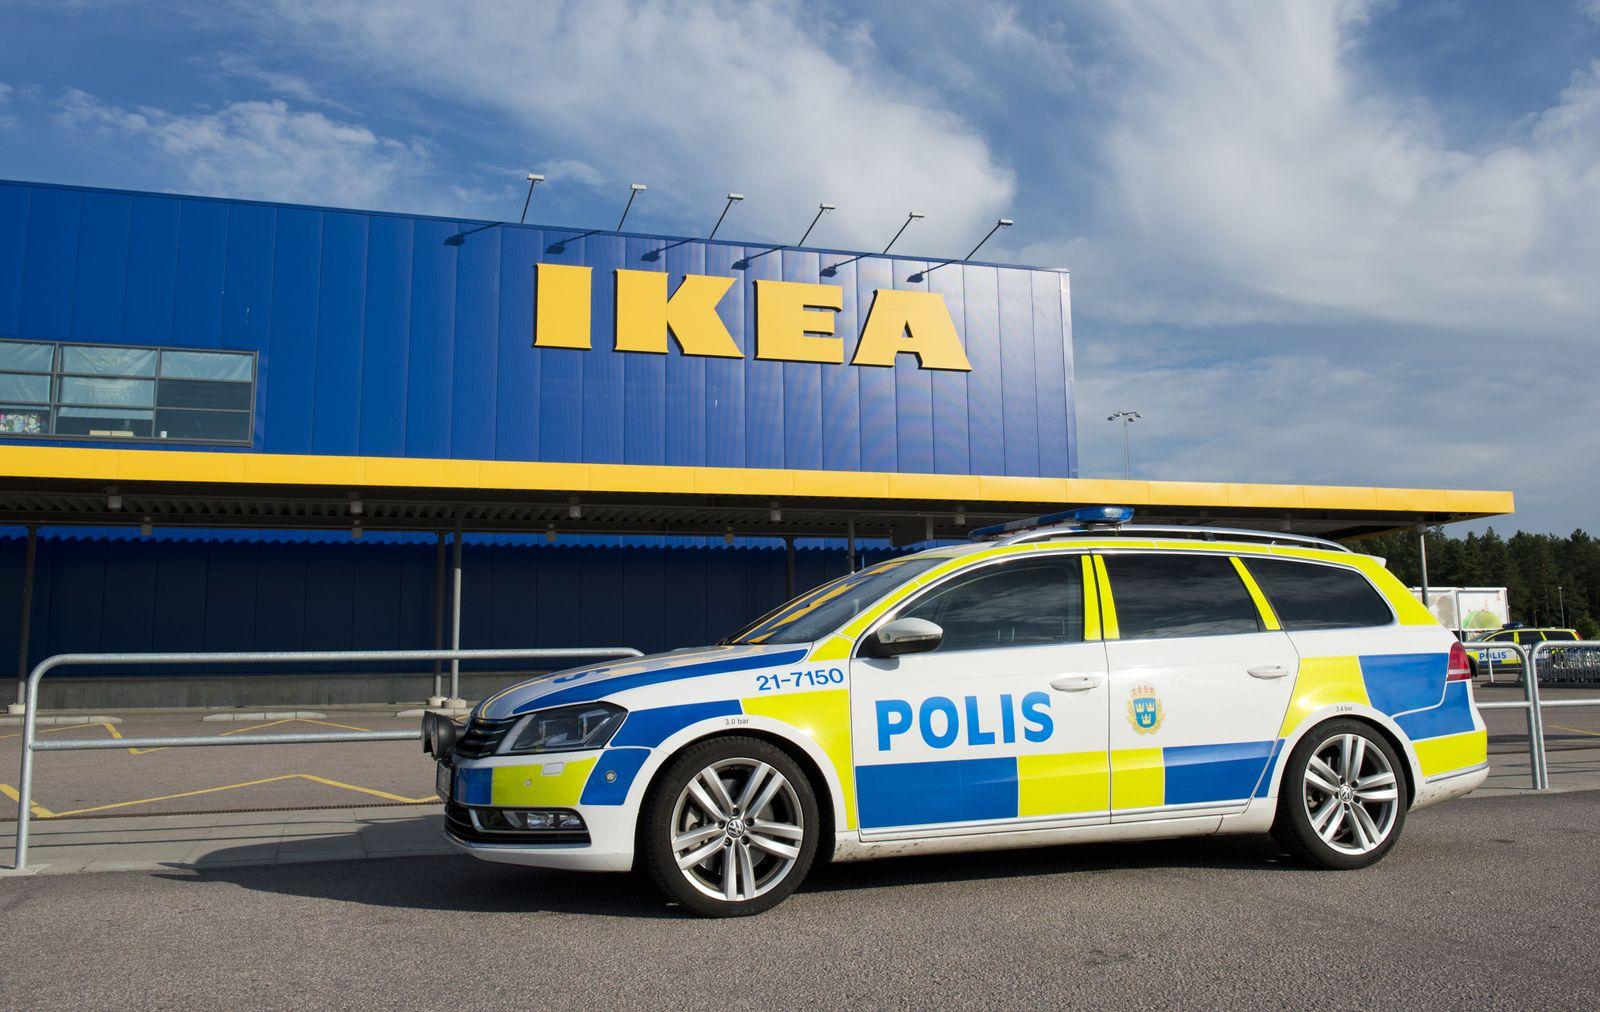 Schweden/ Ikea/ Messerstecherei